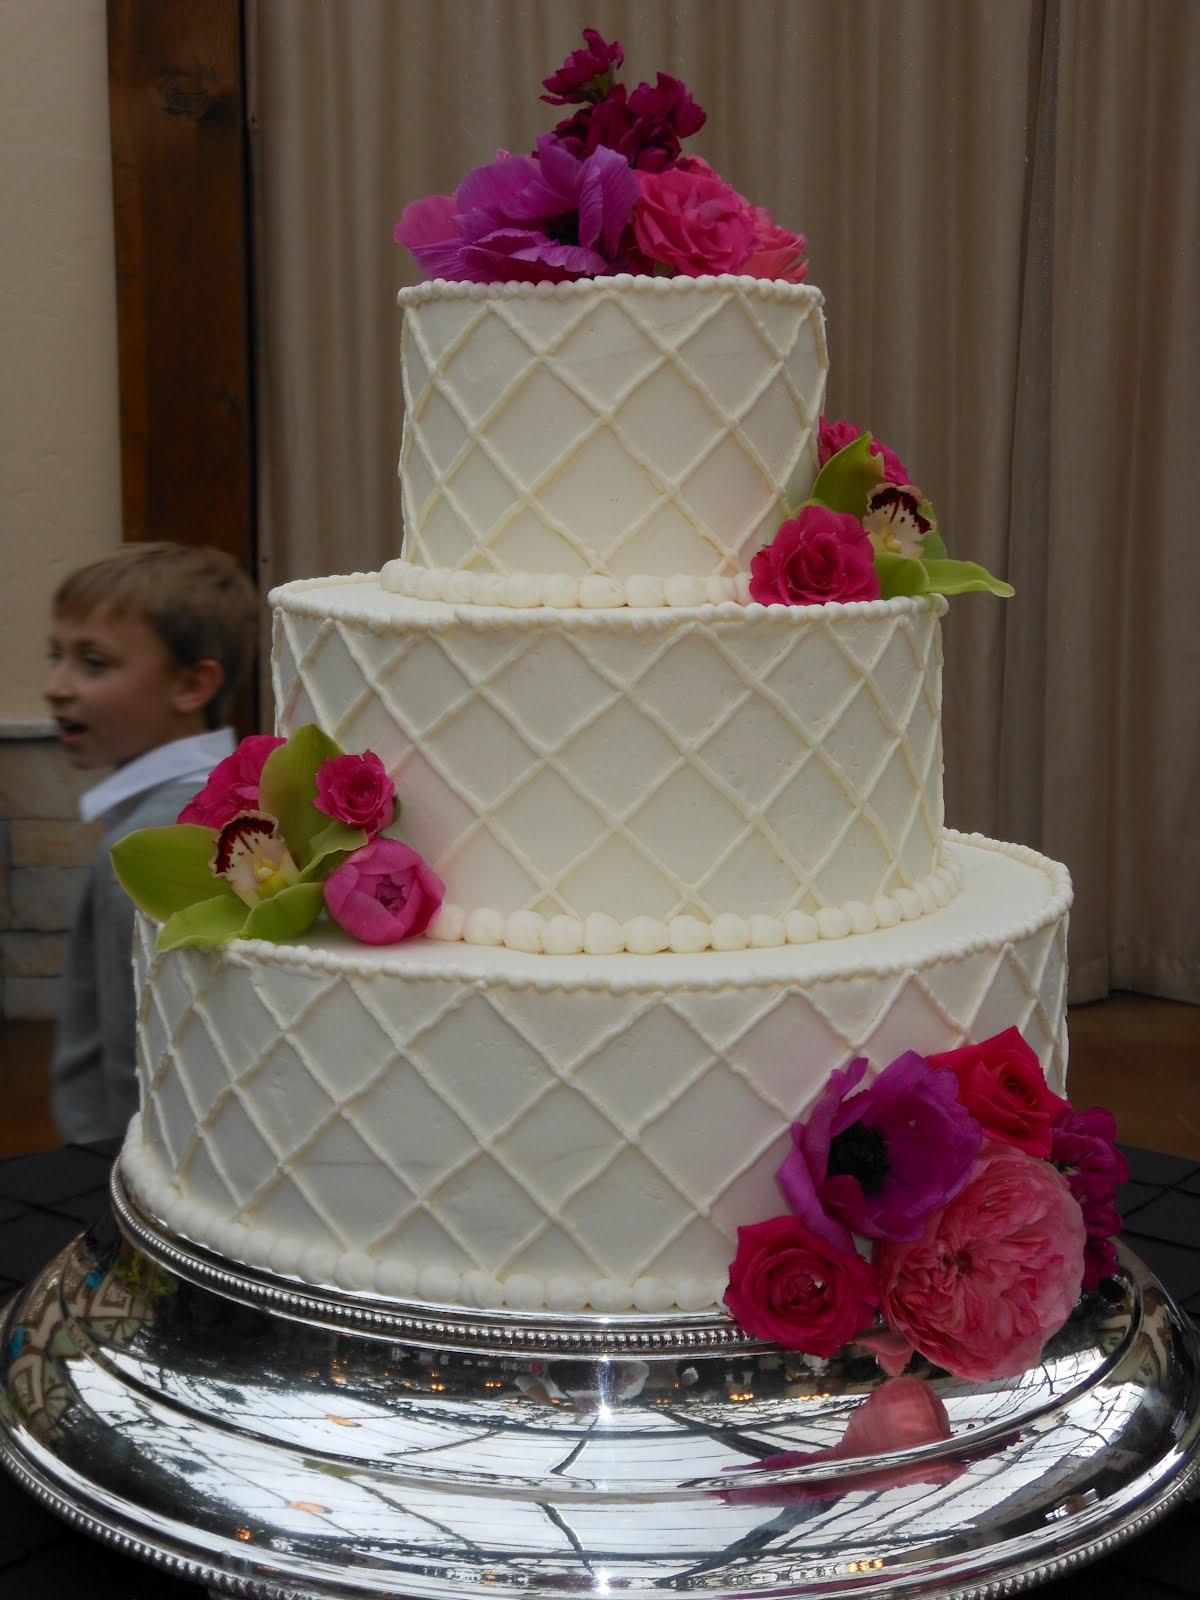 Its A Piece Of Cake Pink Flower Buttercream Lattice Wedding Cake